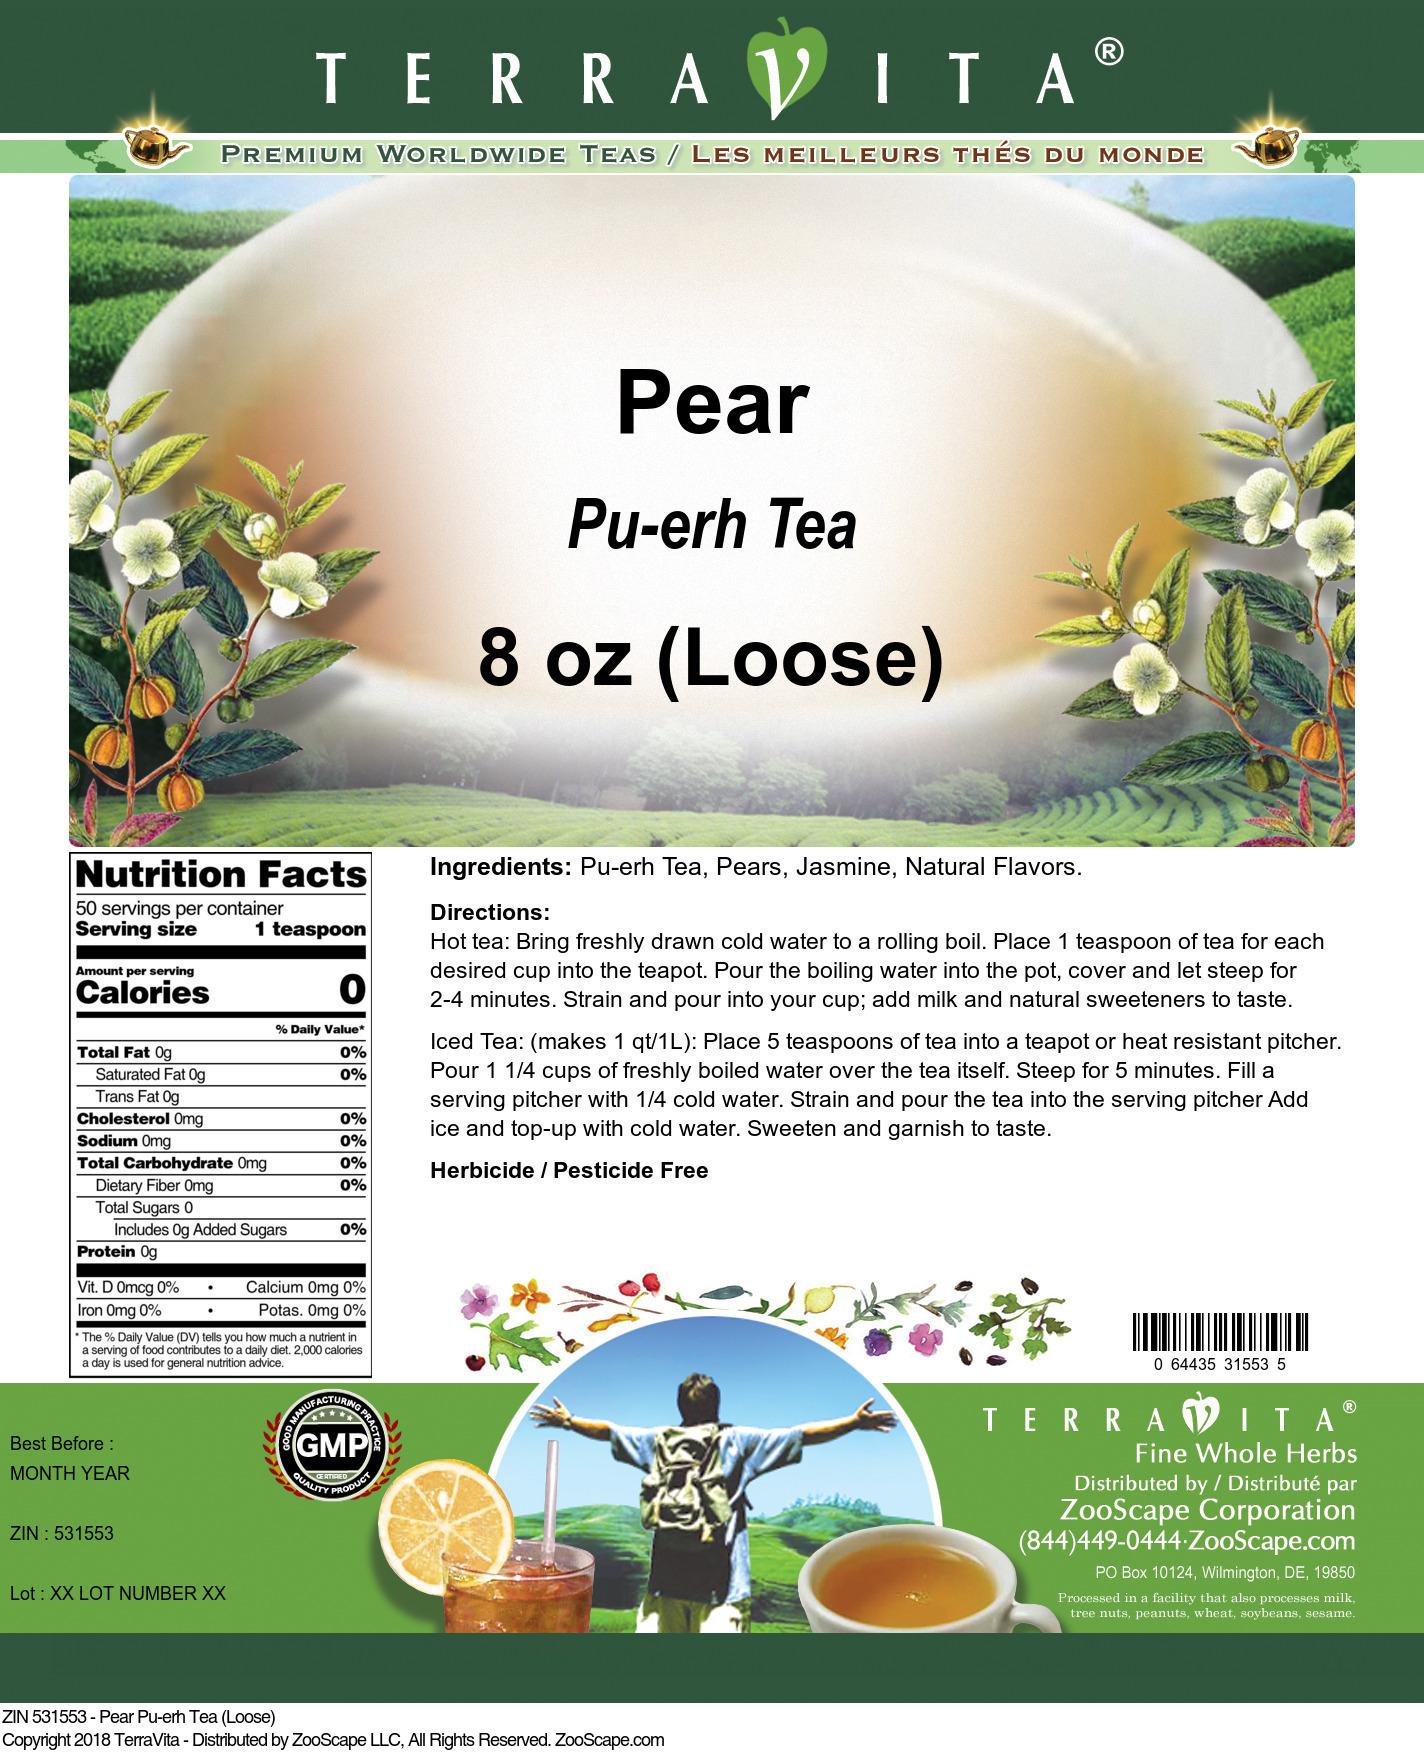 Pear Pu-erh Tea